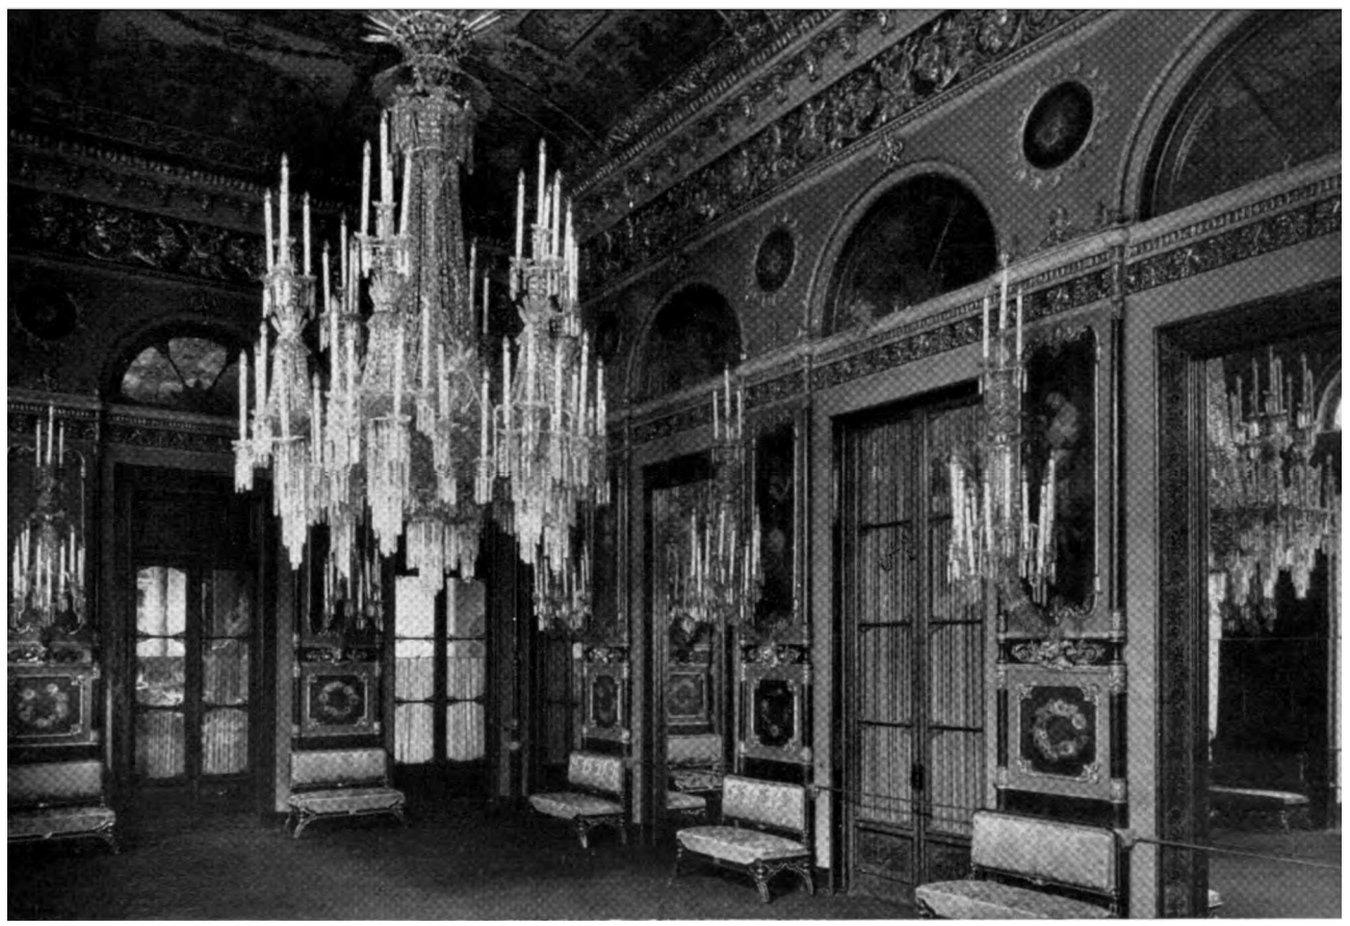 Palazzo Spinola in v